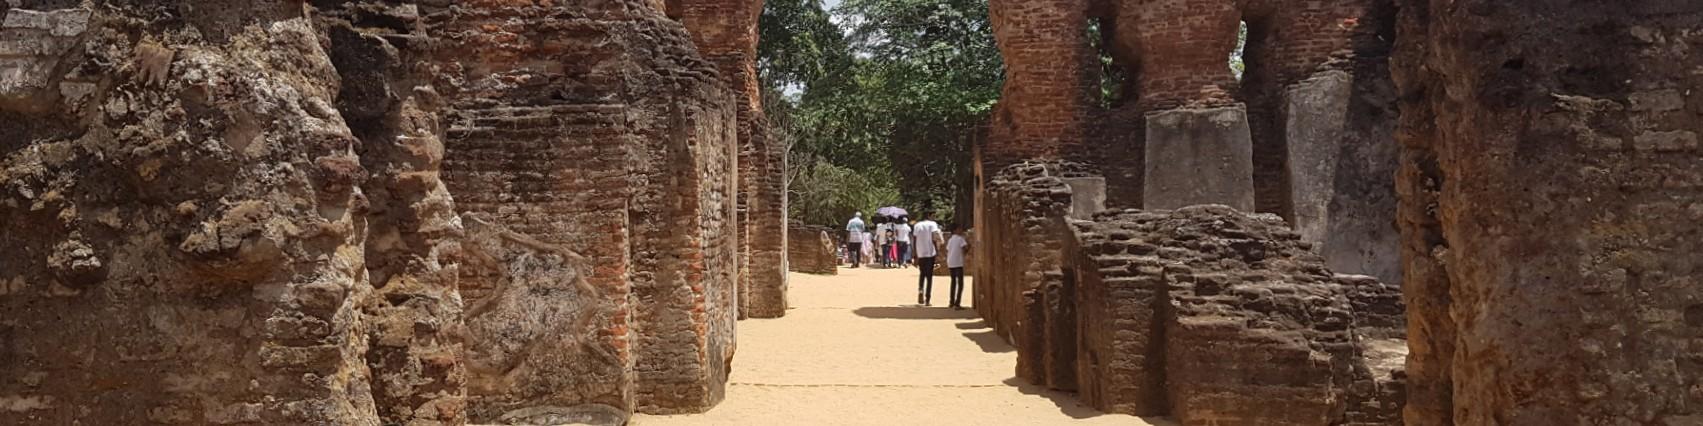 The Royal Palace, Polonnaruwa Historical Site